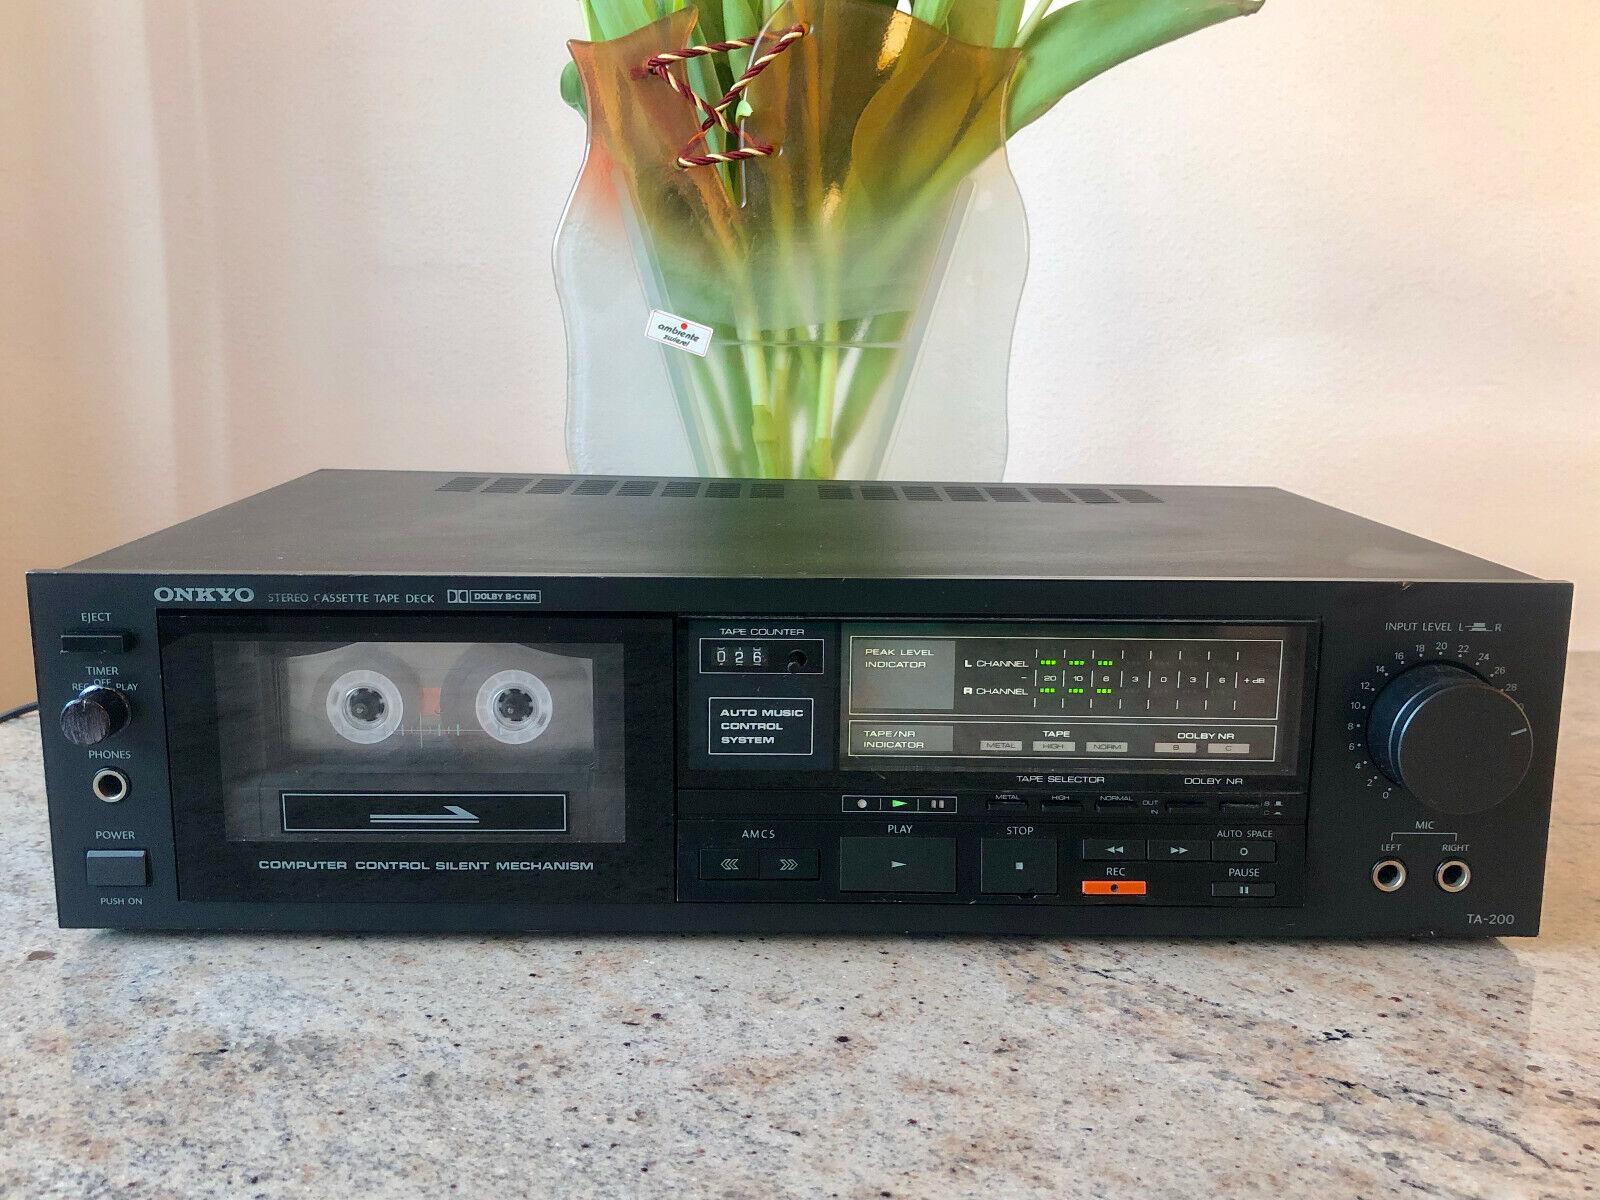 90pc Riemen Antriebsriemen 26-120mm für Kassettendeck Cassette Tape Deck Belt DL